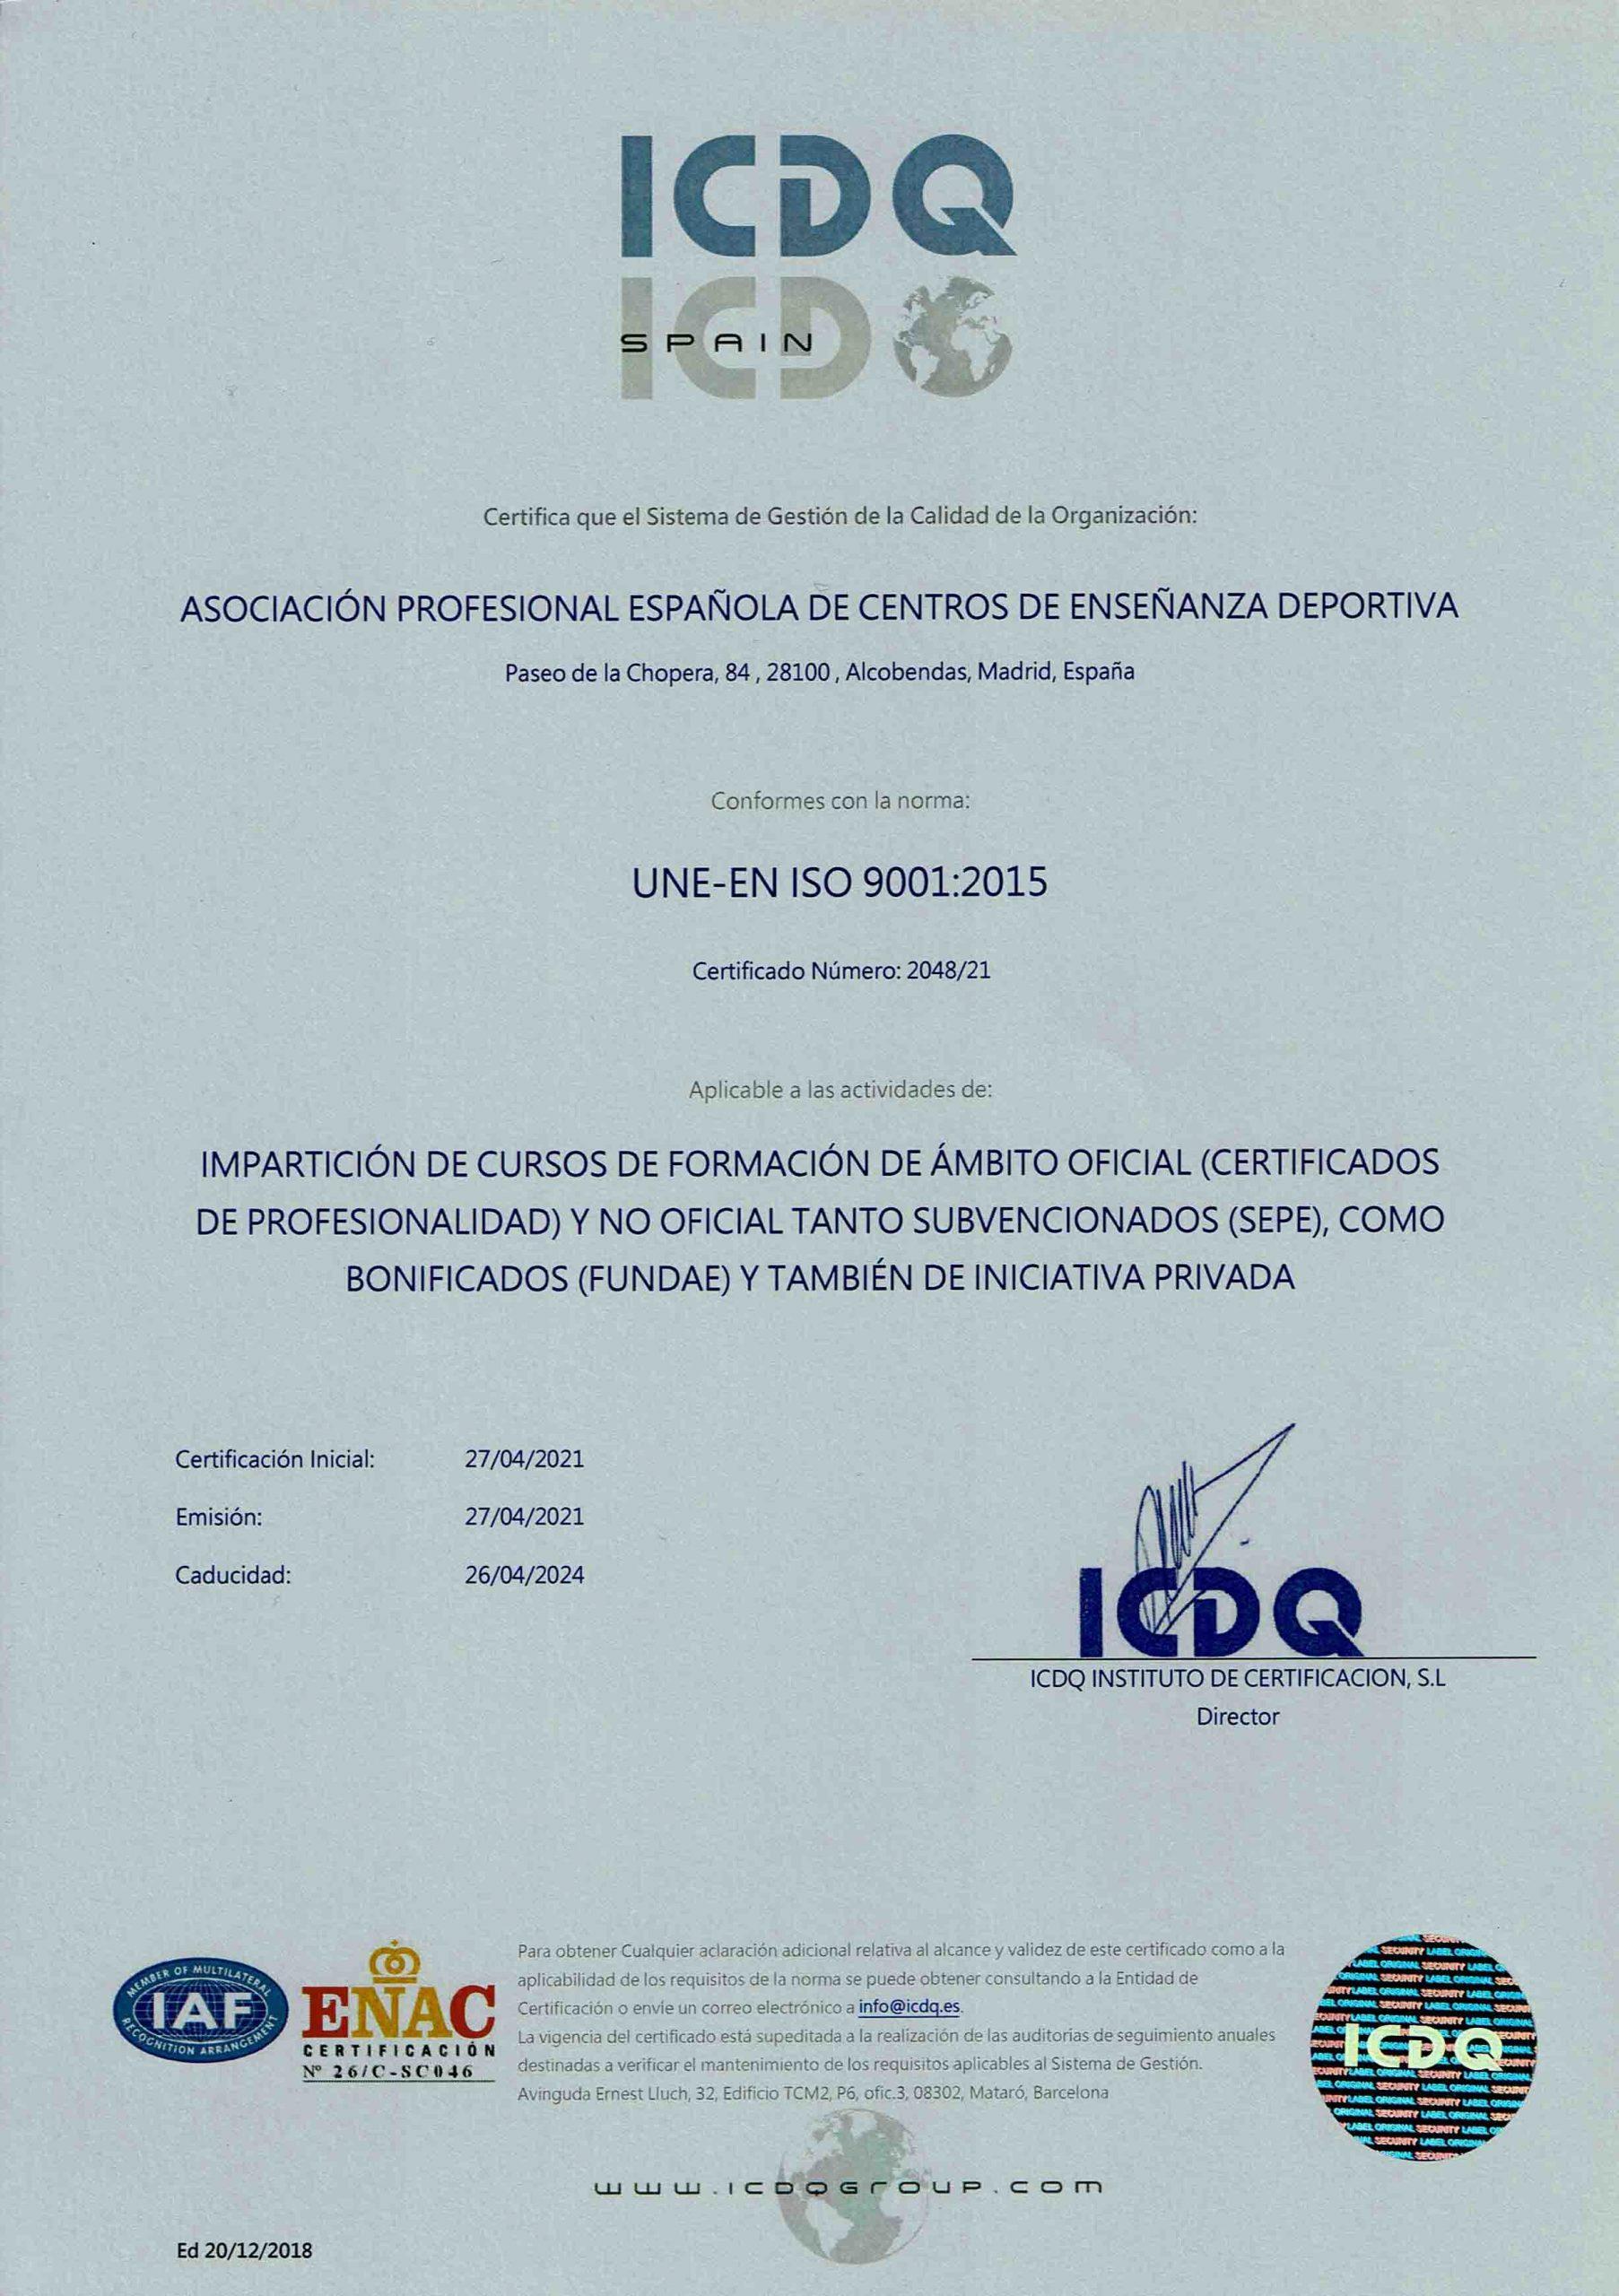 documento iso 9001 certificado apeced pro